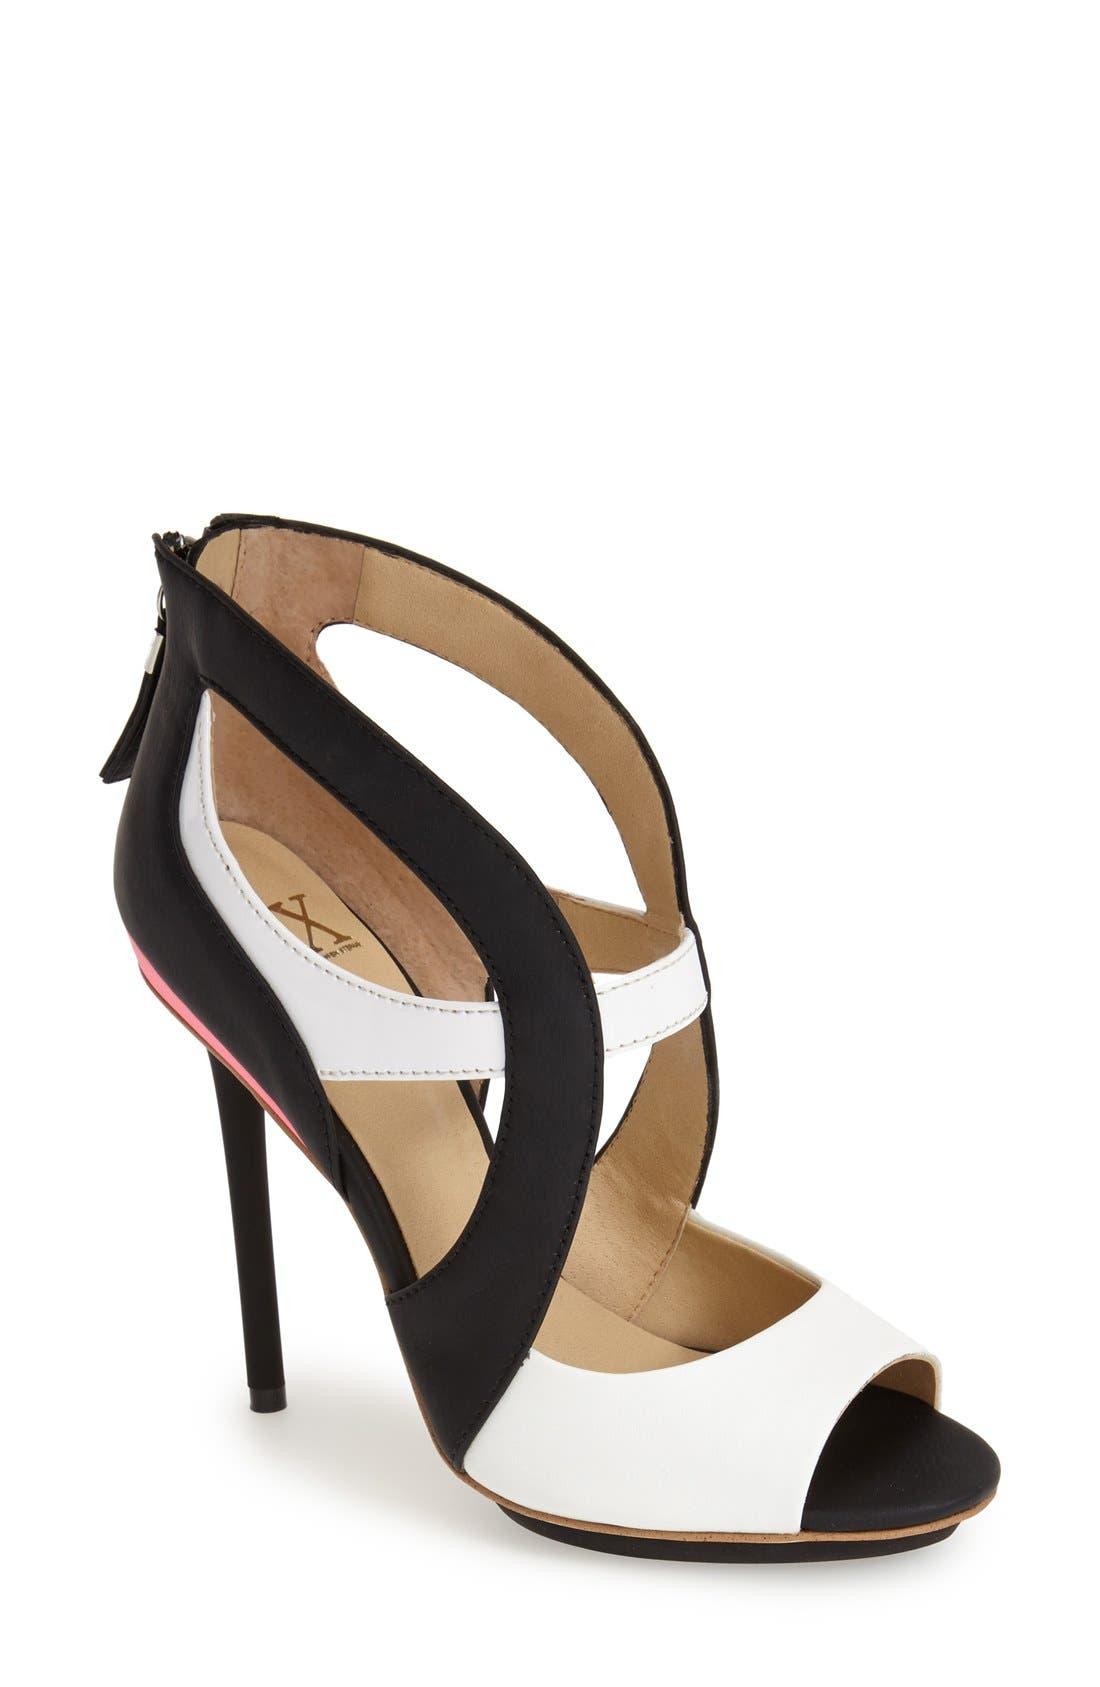 Alternate Image 1 Selected - gx by Gwen Stefani 'Dart' Colorblock Cutout Sandal (Women)